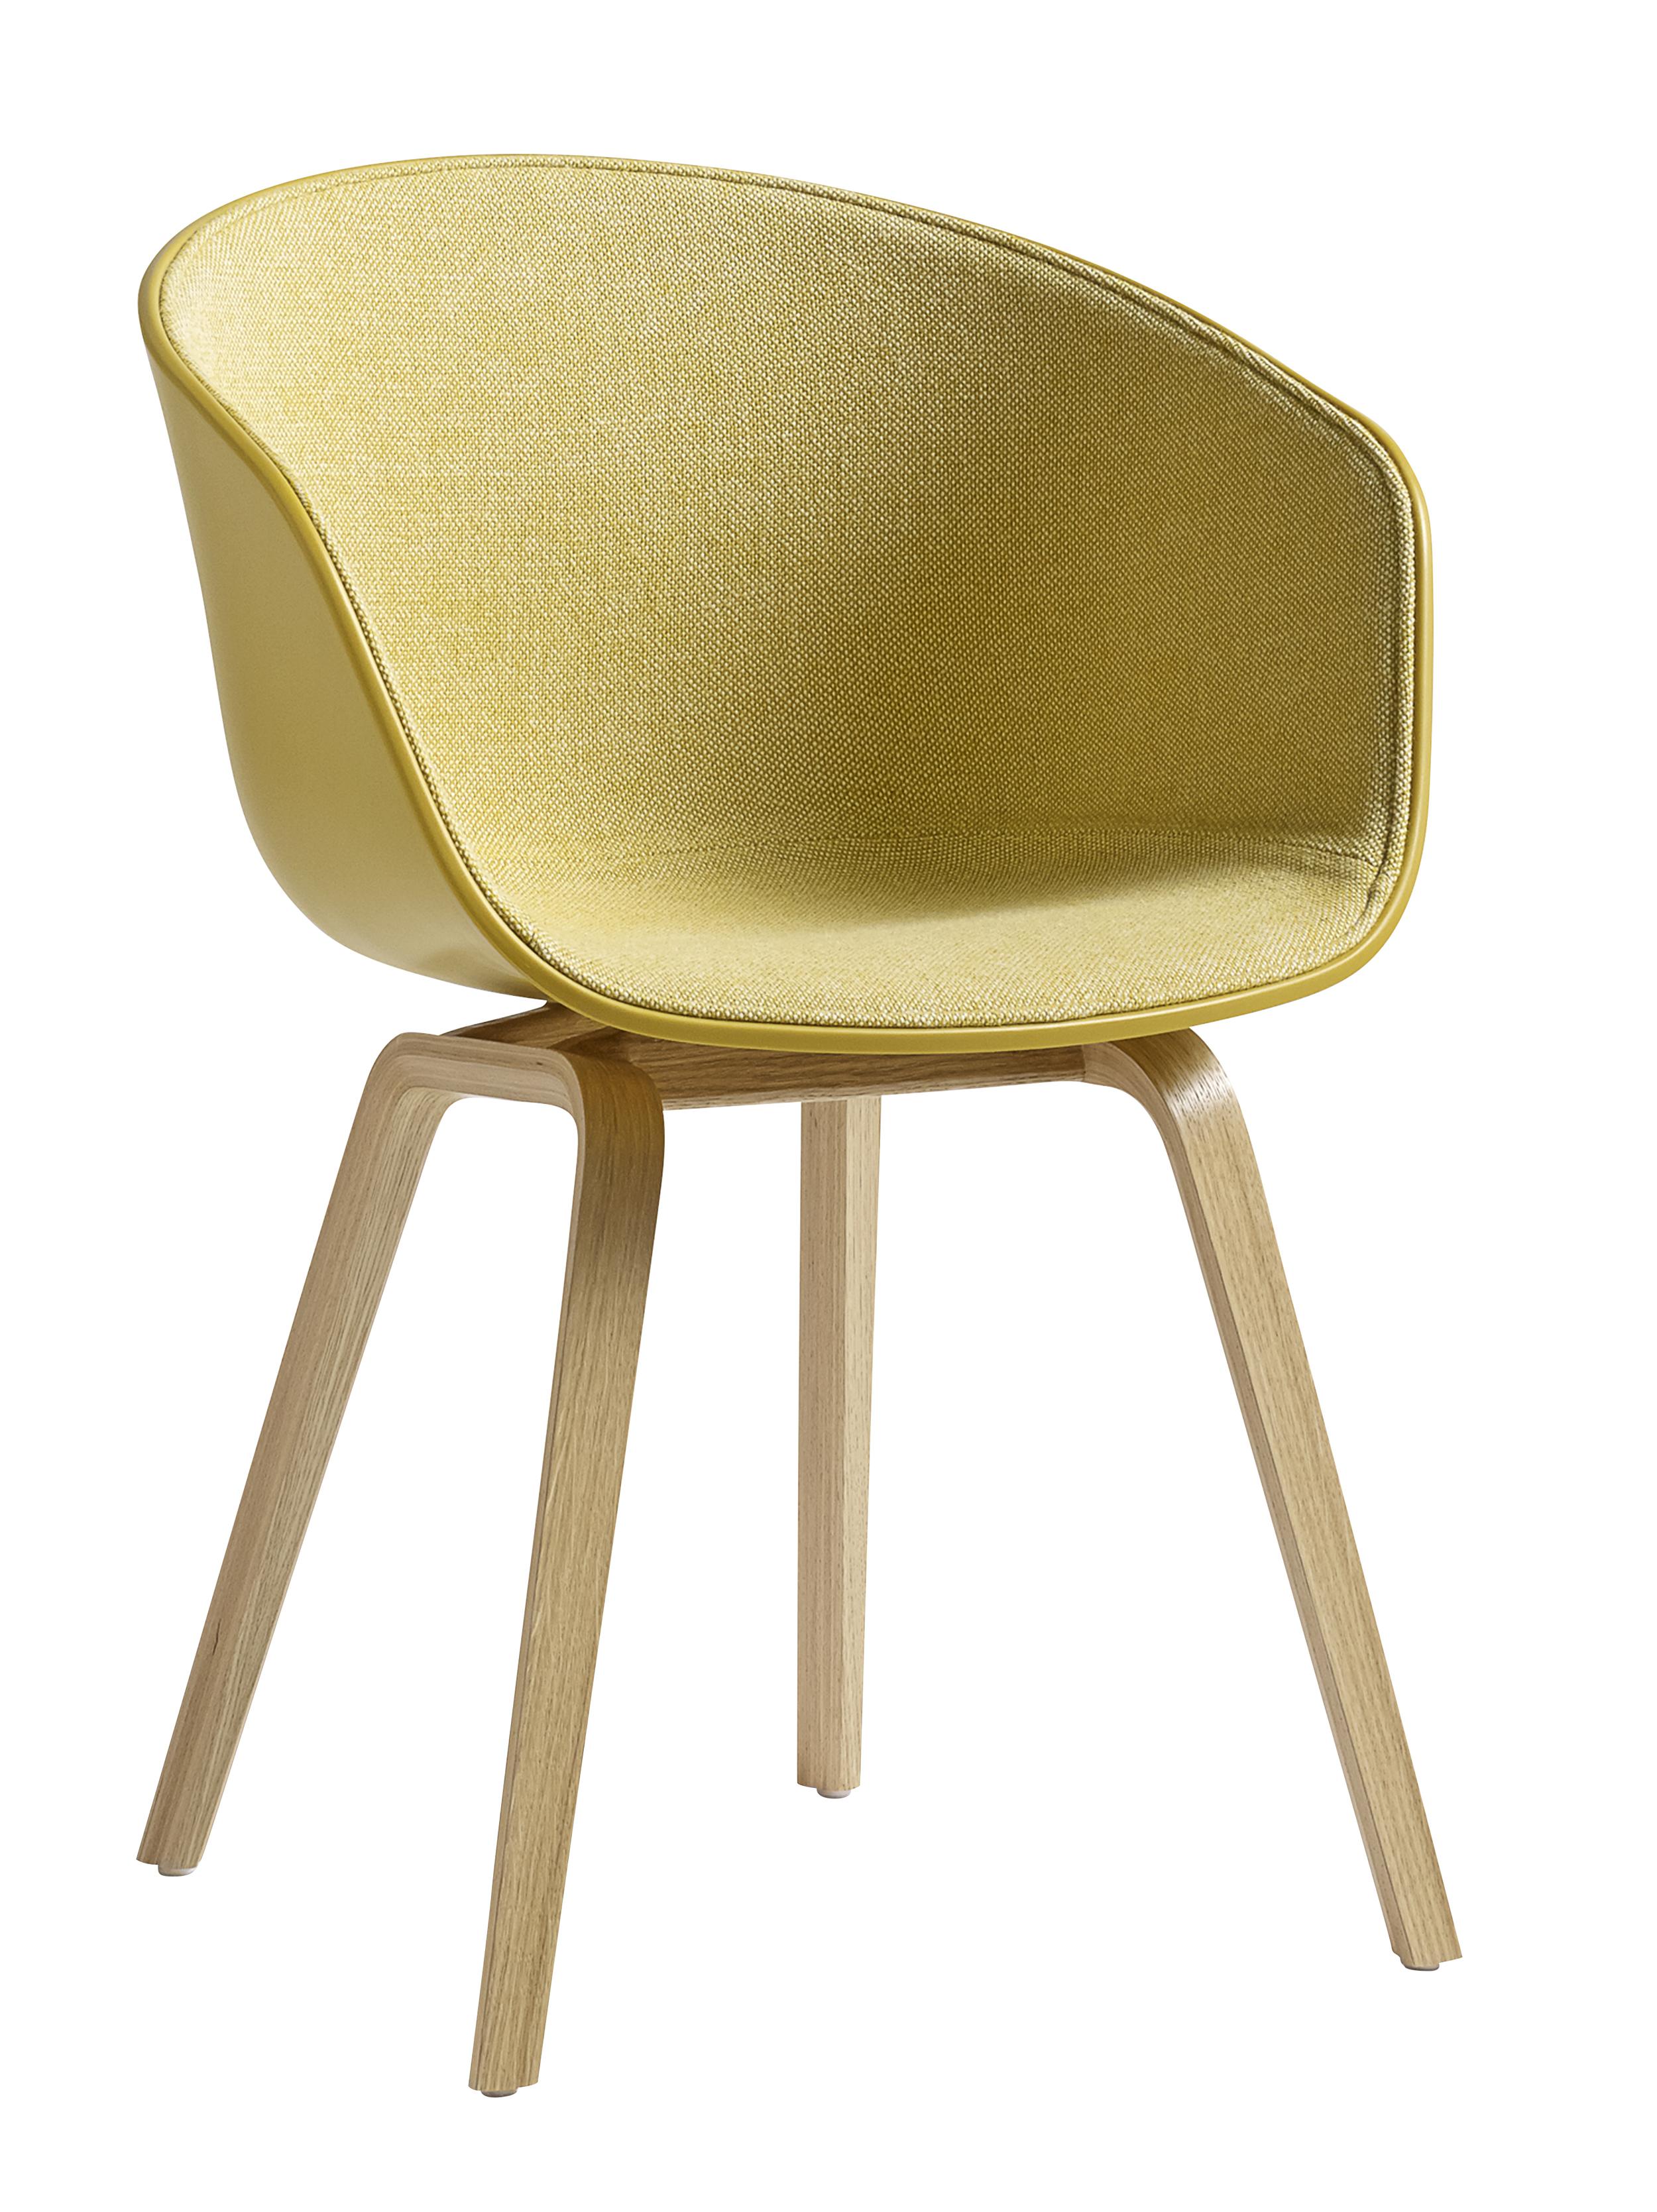 AAC23 Oak lacquer Base hallingdal 407 HAY About a chair design stoel Loncin design meubel zetel Leuven Brussels mechelen antwerpen vlaams-branbant Limburg Hasselt Tongeren Genk Sint-Truiden Zoutleeuw.jpg